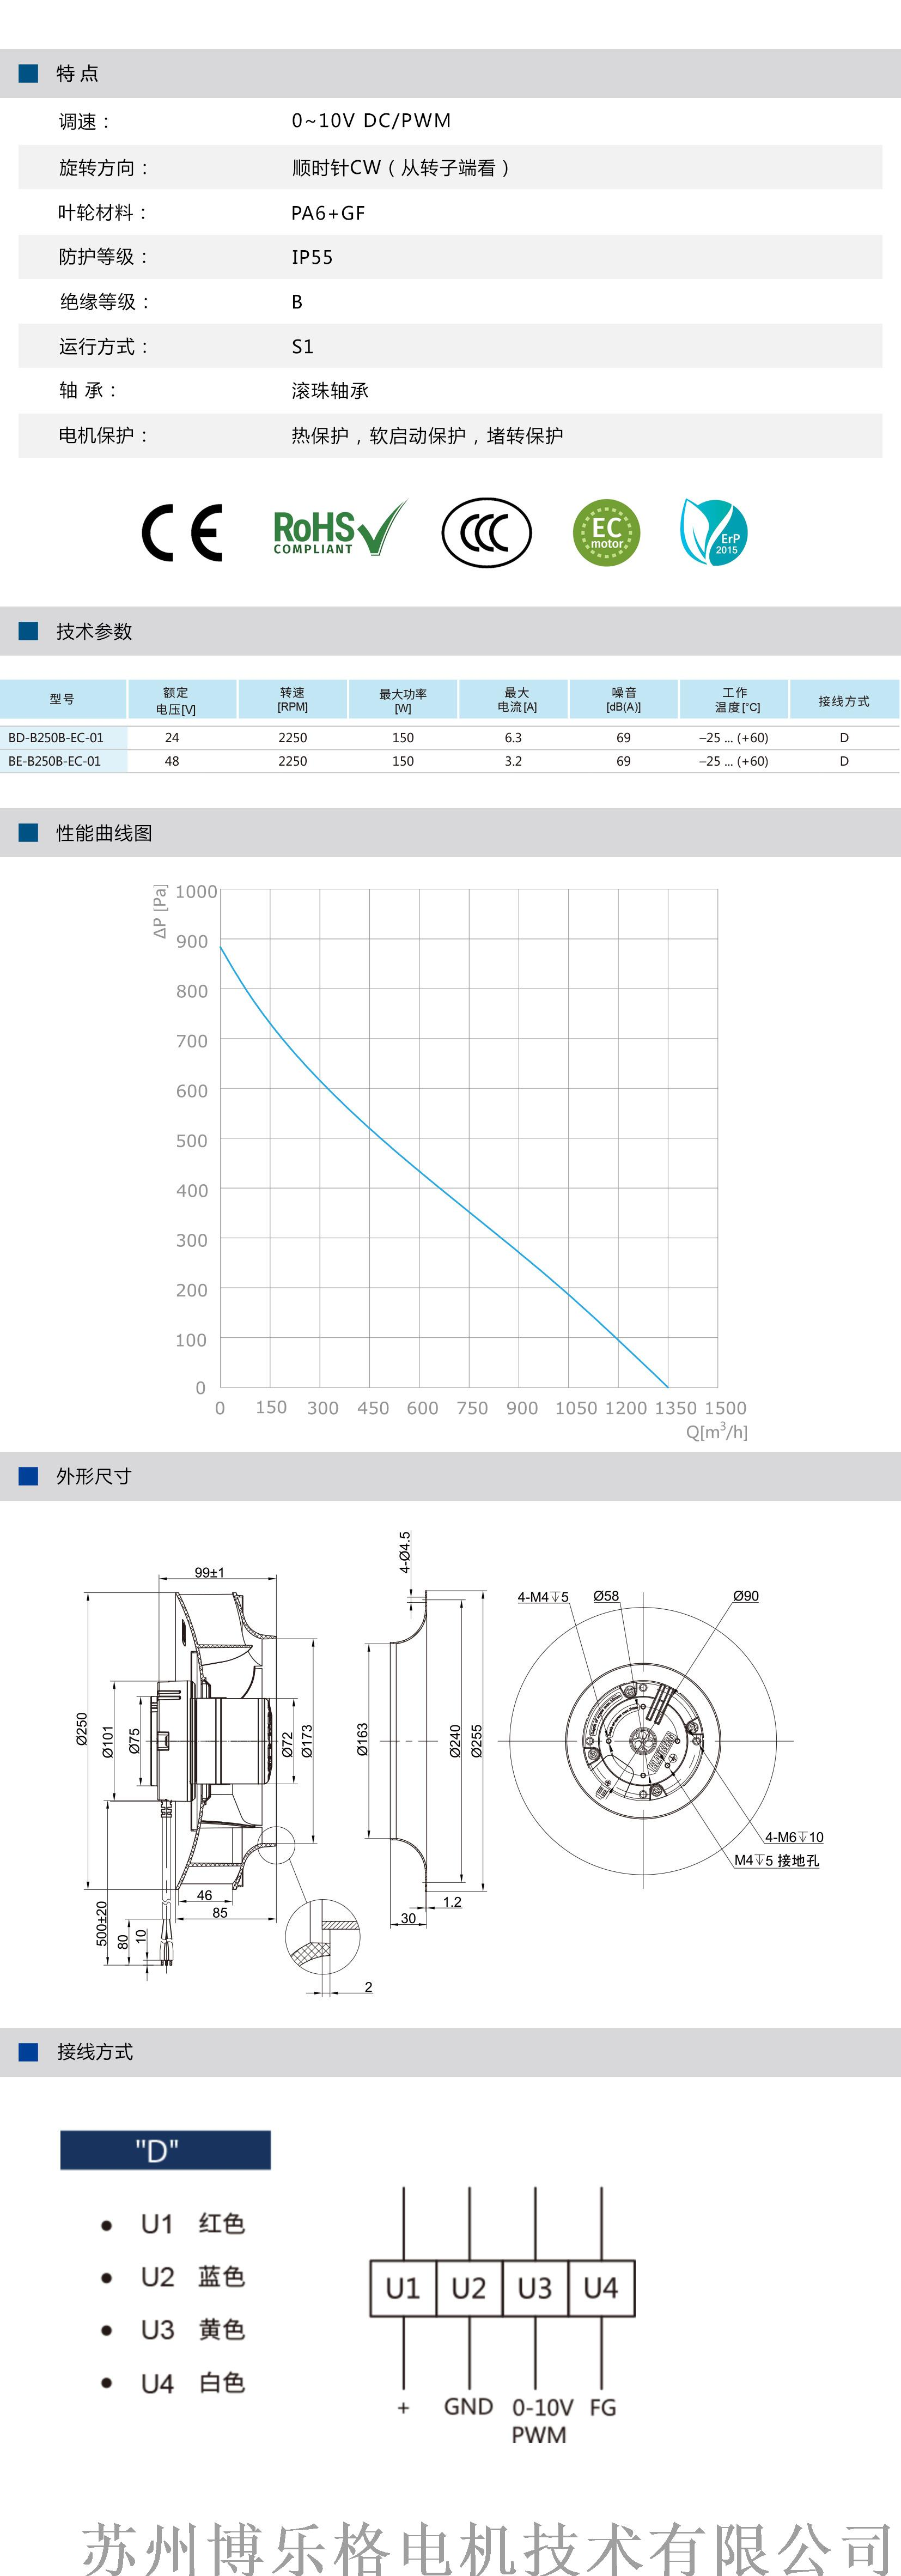 BD-B250B-EC-01.png-2020-07-21-14-00-19-851.jpg